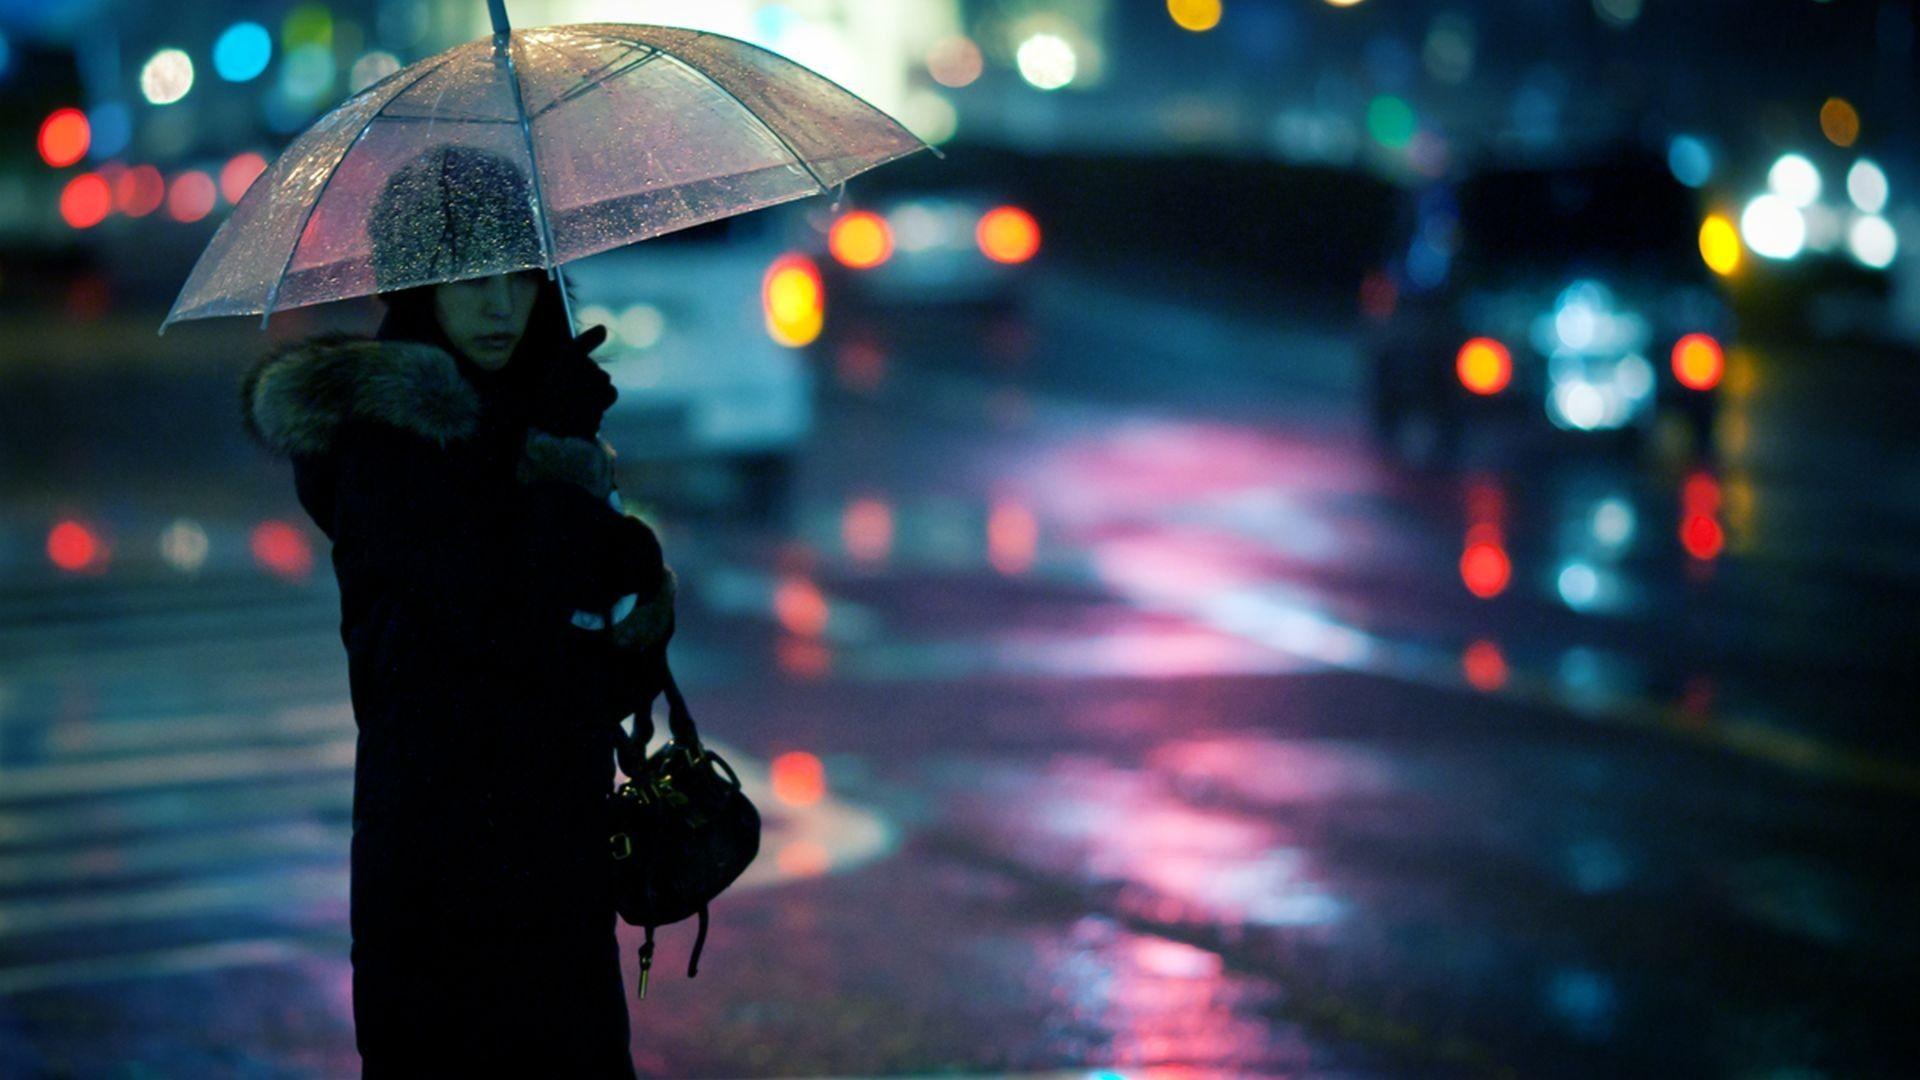 Women Cityscapes Rain Outdoors Traffic Lights Bokeh Umbrellas Fresh New Hd Wallpaper Jpg Rain Wallpapers Rain Photography Rain Art